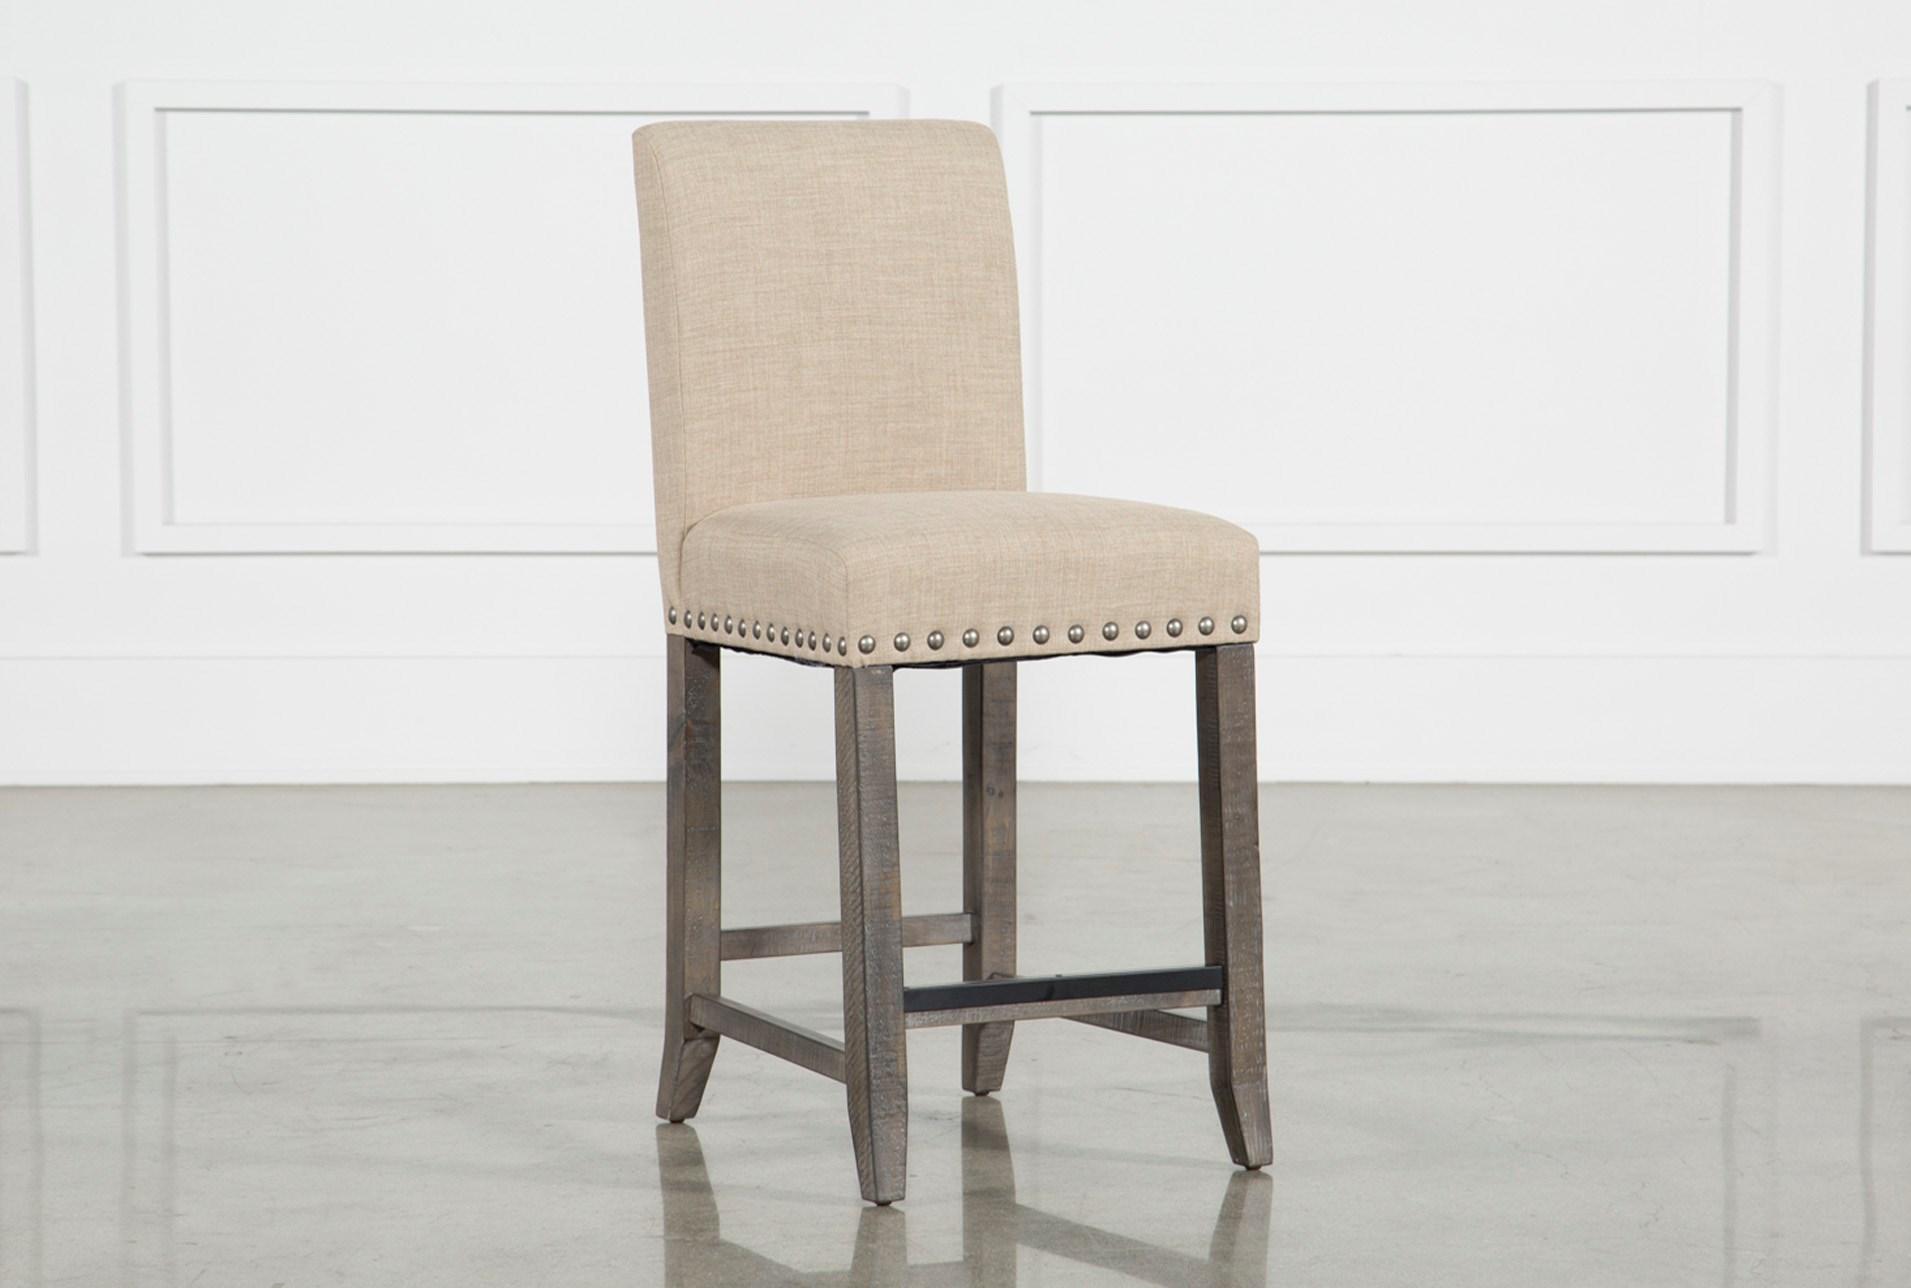 Groovy Jaxon Grey Fabric Counter Stool Andrewgaddart Wooden Chair Designs For Living Room Andrewgaddartcom